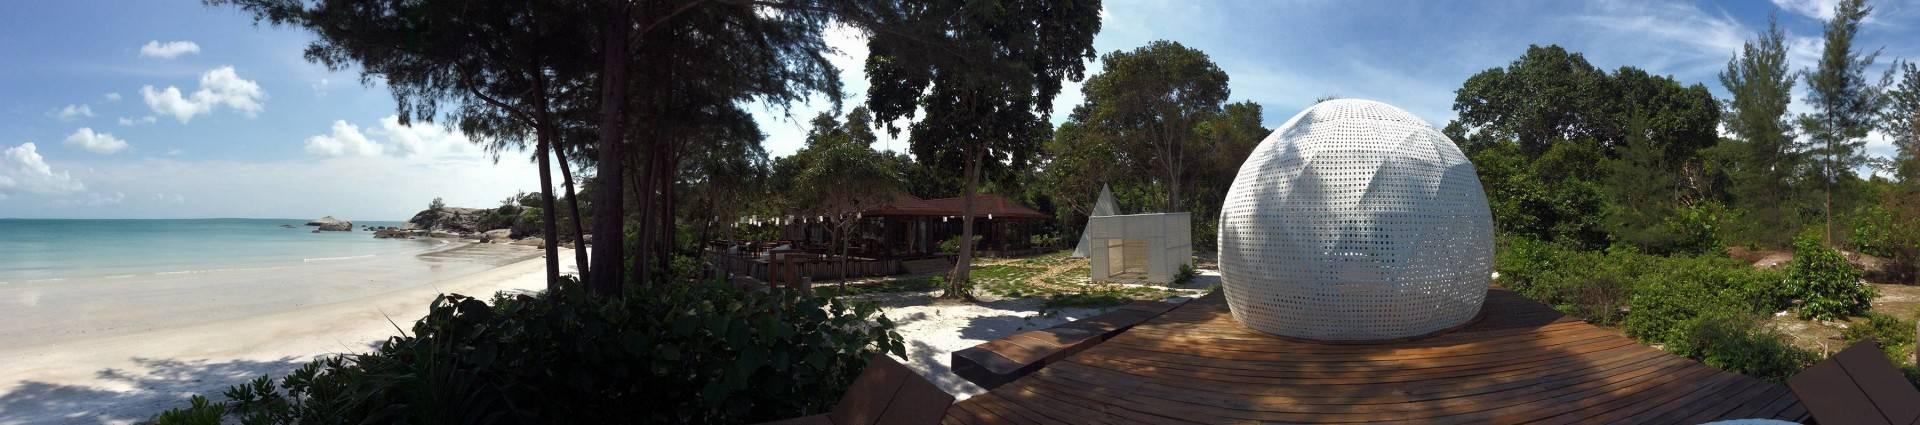 Raw Architecture Arumdalu Belitung Belitung Beach View Tropis  1629